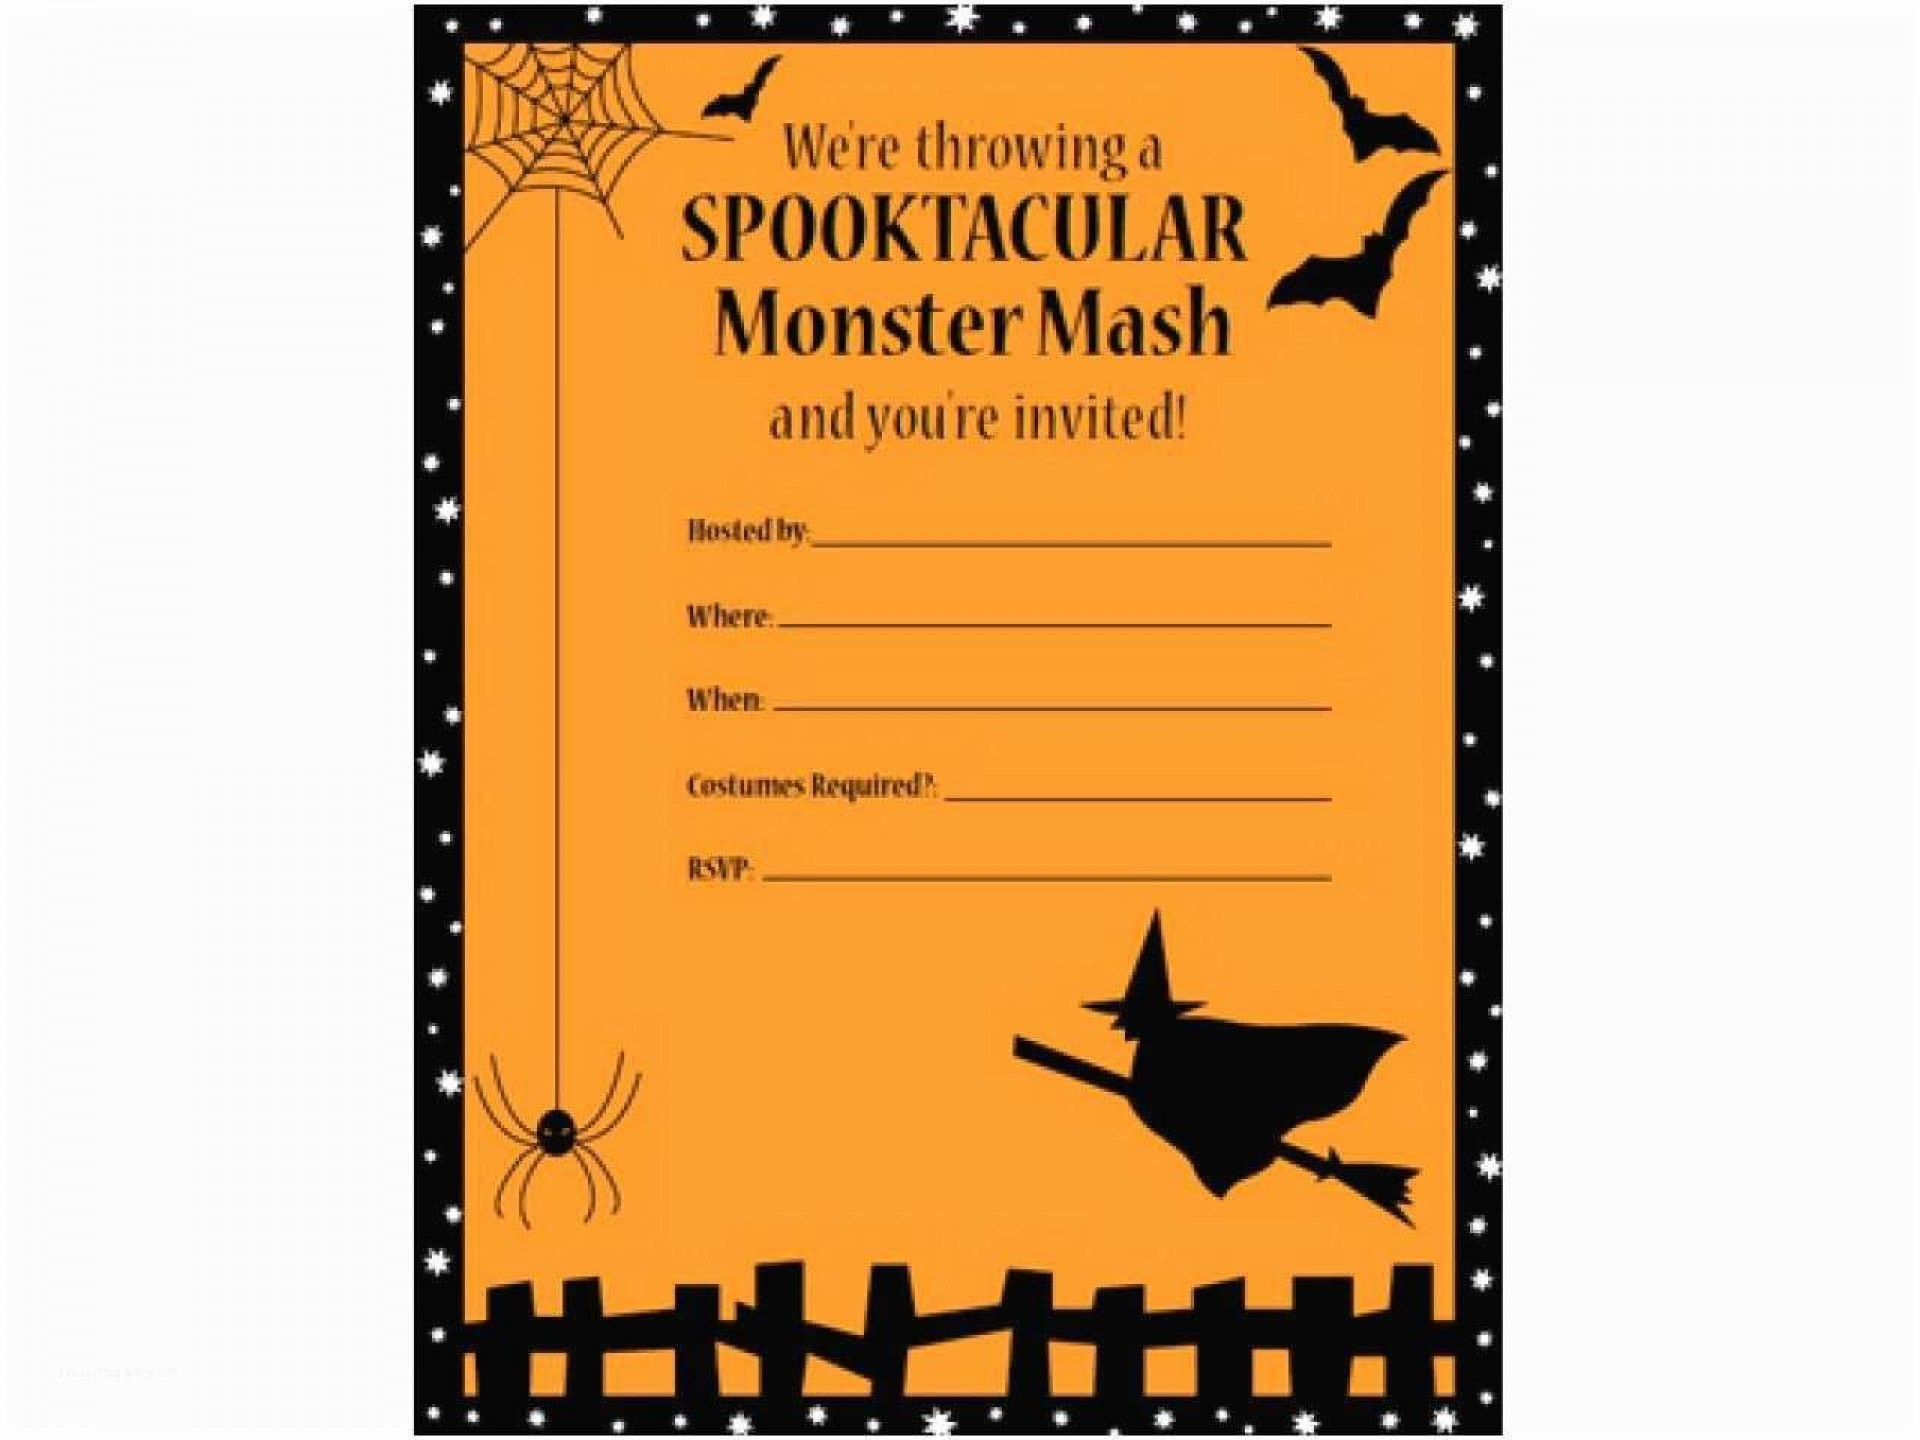 008 Breathtaking Halloween Party Invite Template Example  Templates - Free Printable Spooky Invitation Birthday1920